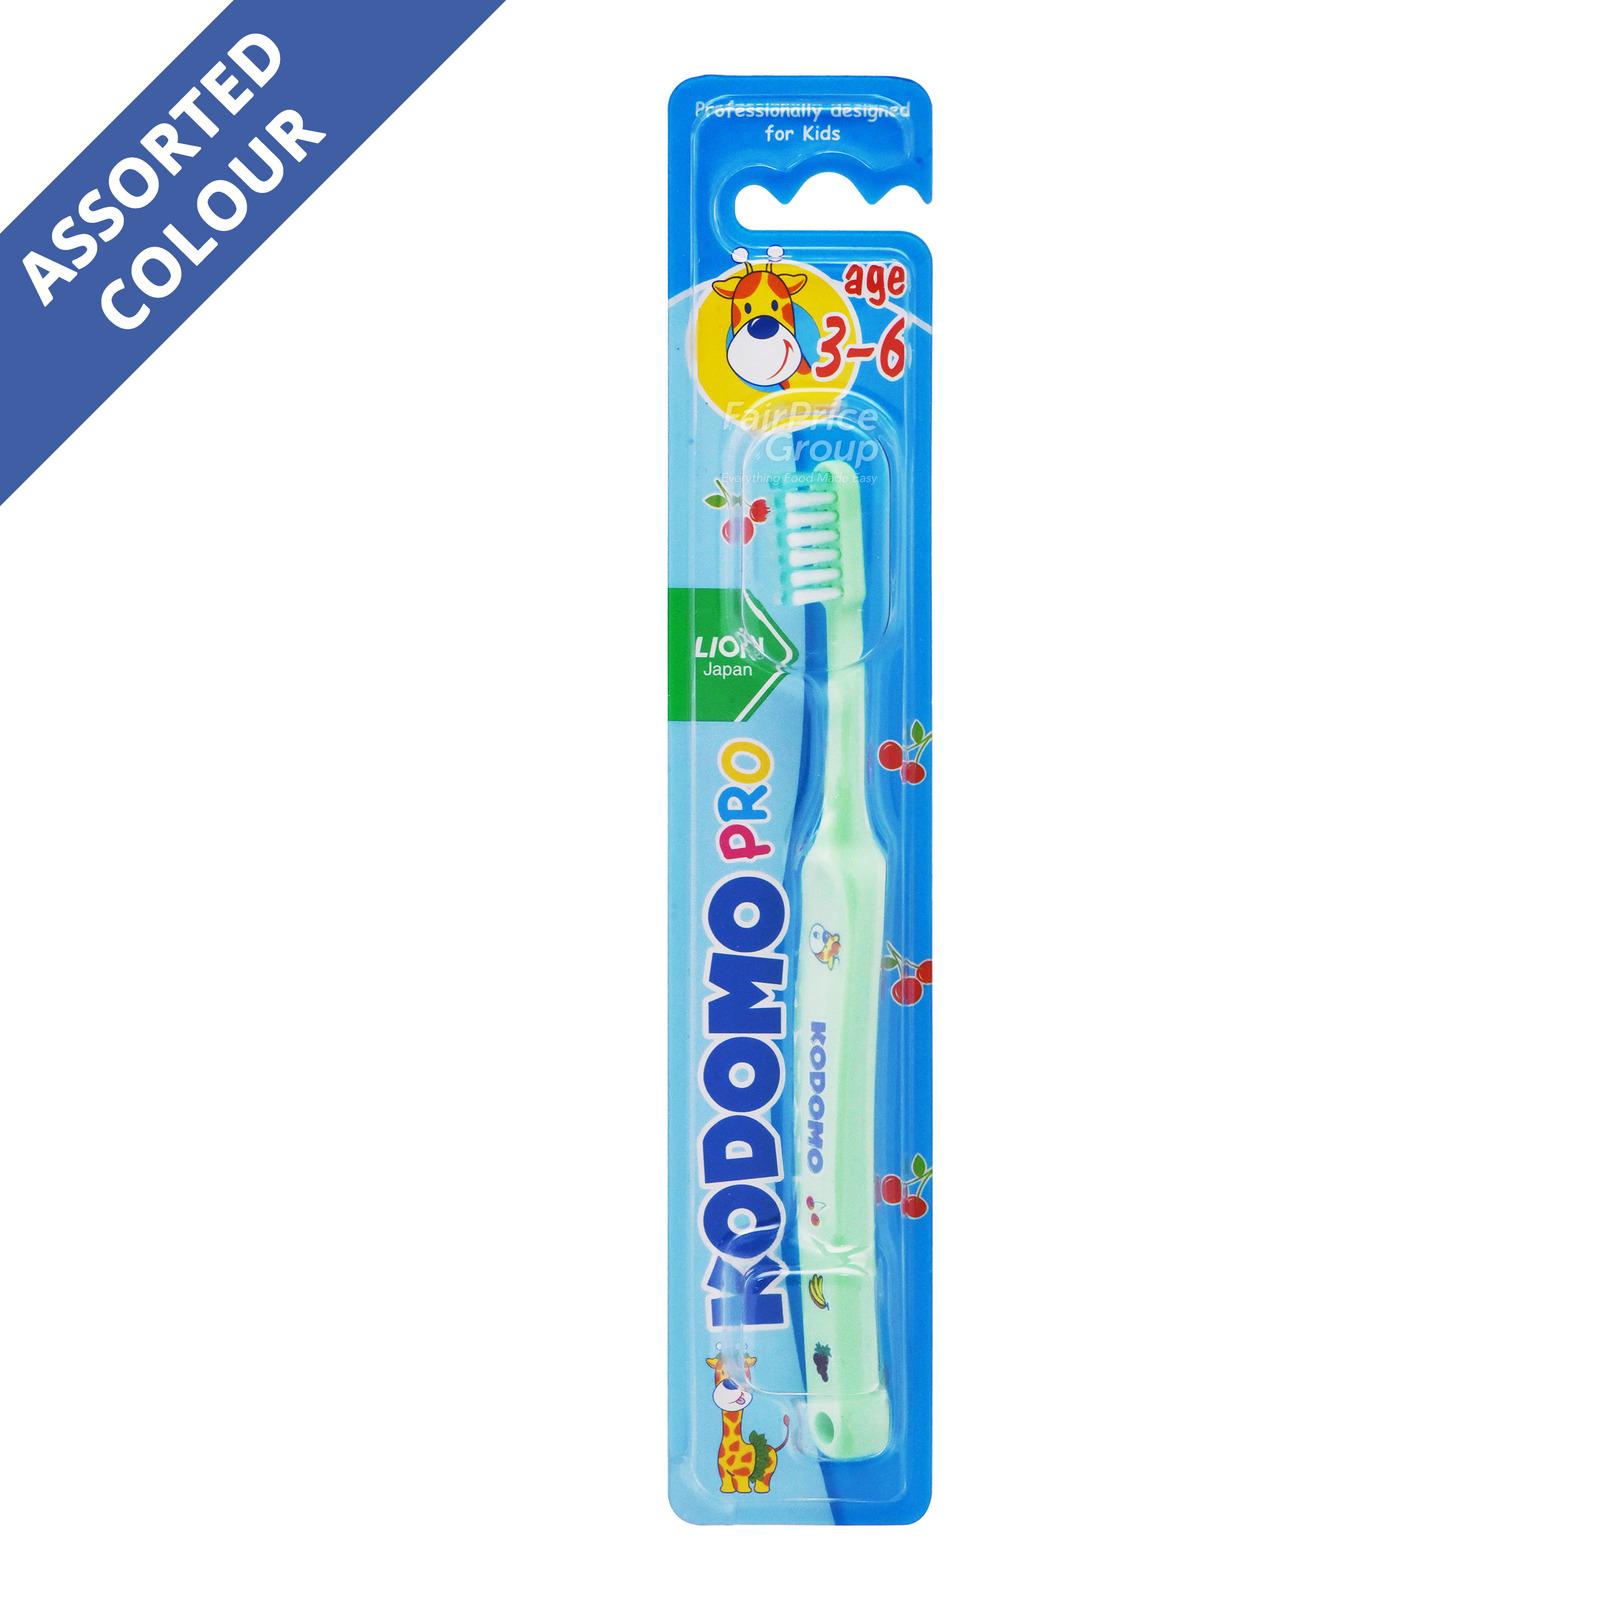 Kodomo Children Toothbrush - Pro (3 - 6 years old)